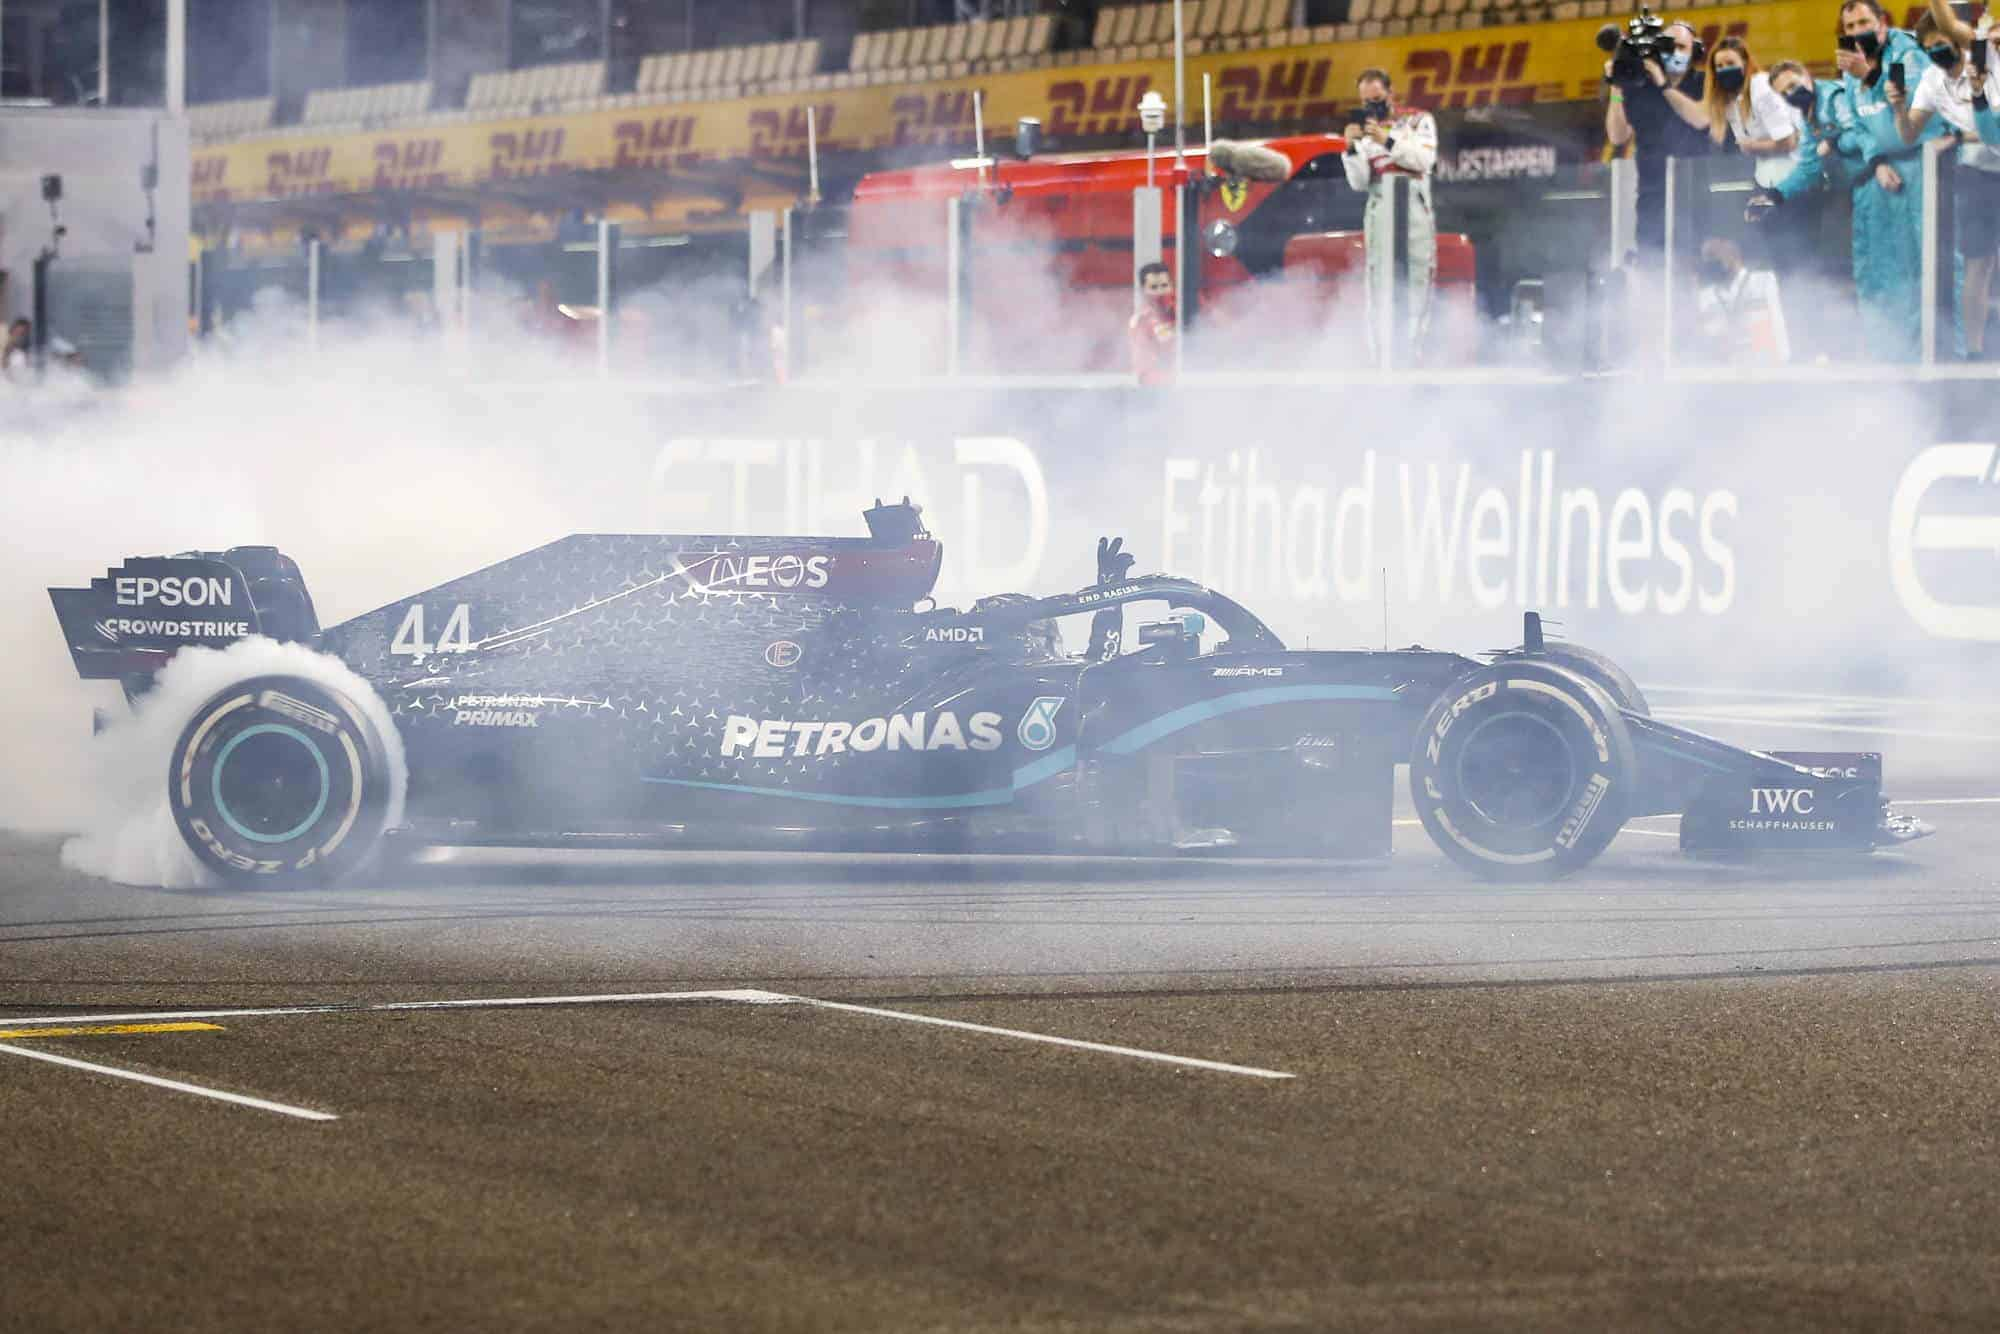 2020 Abu Dhabi GP Hamilton Mercedes hard Pirelli after the race donuts Photo Daimler